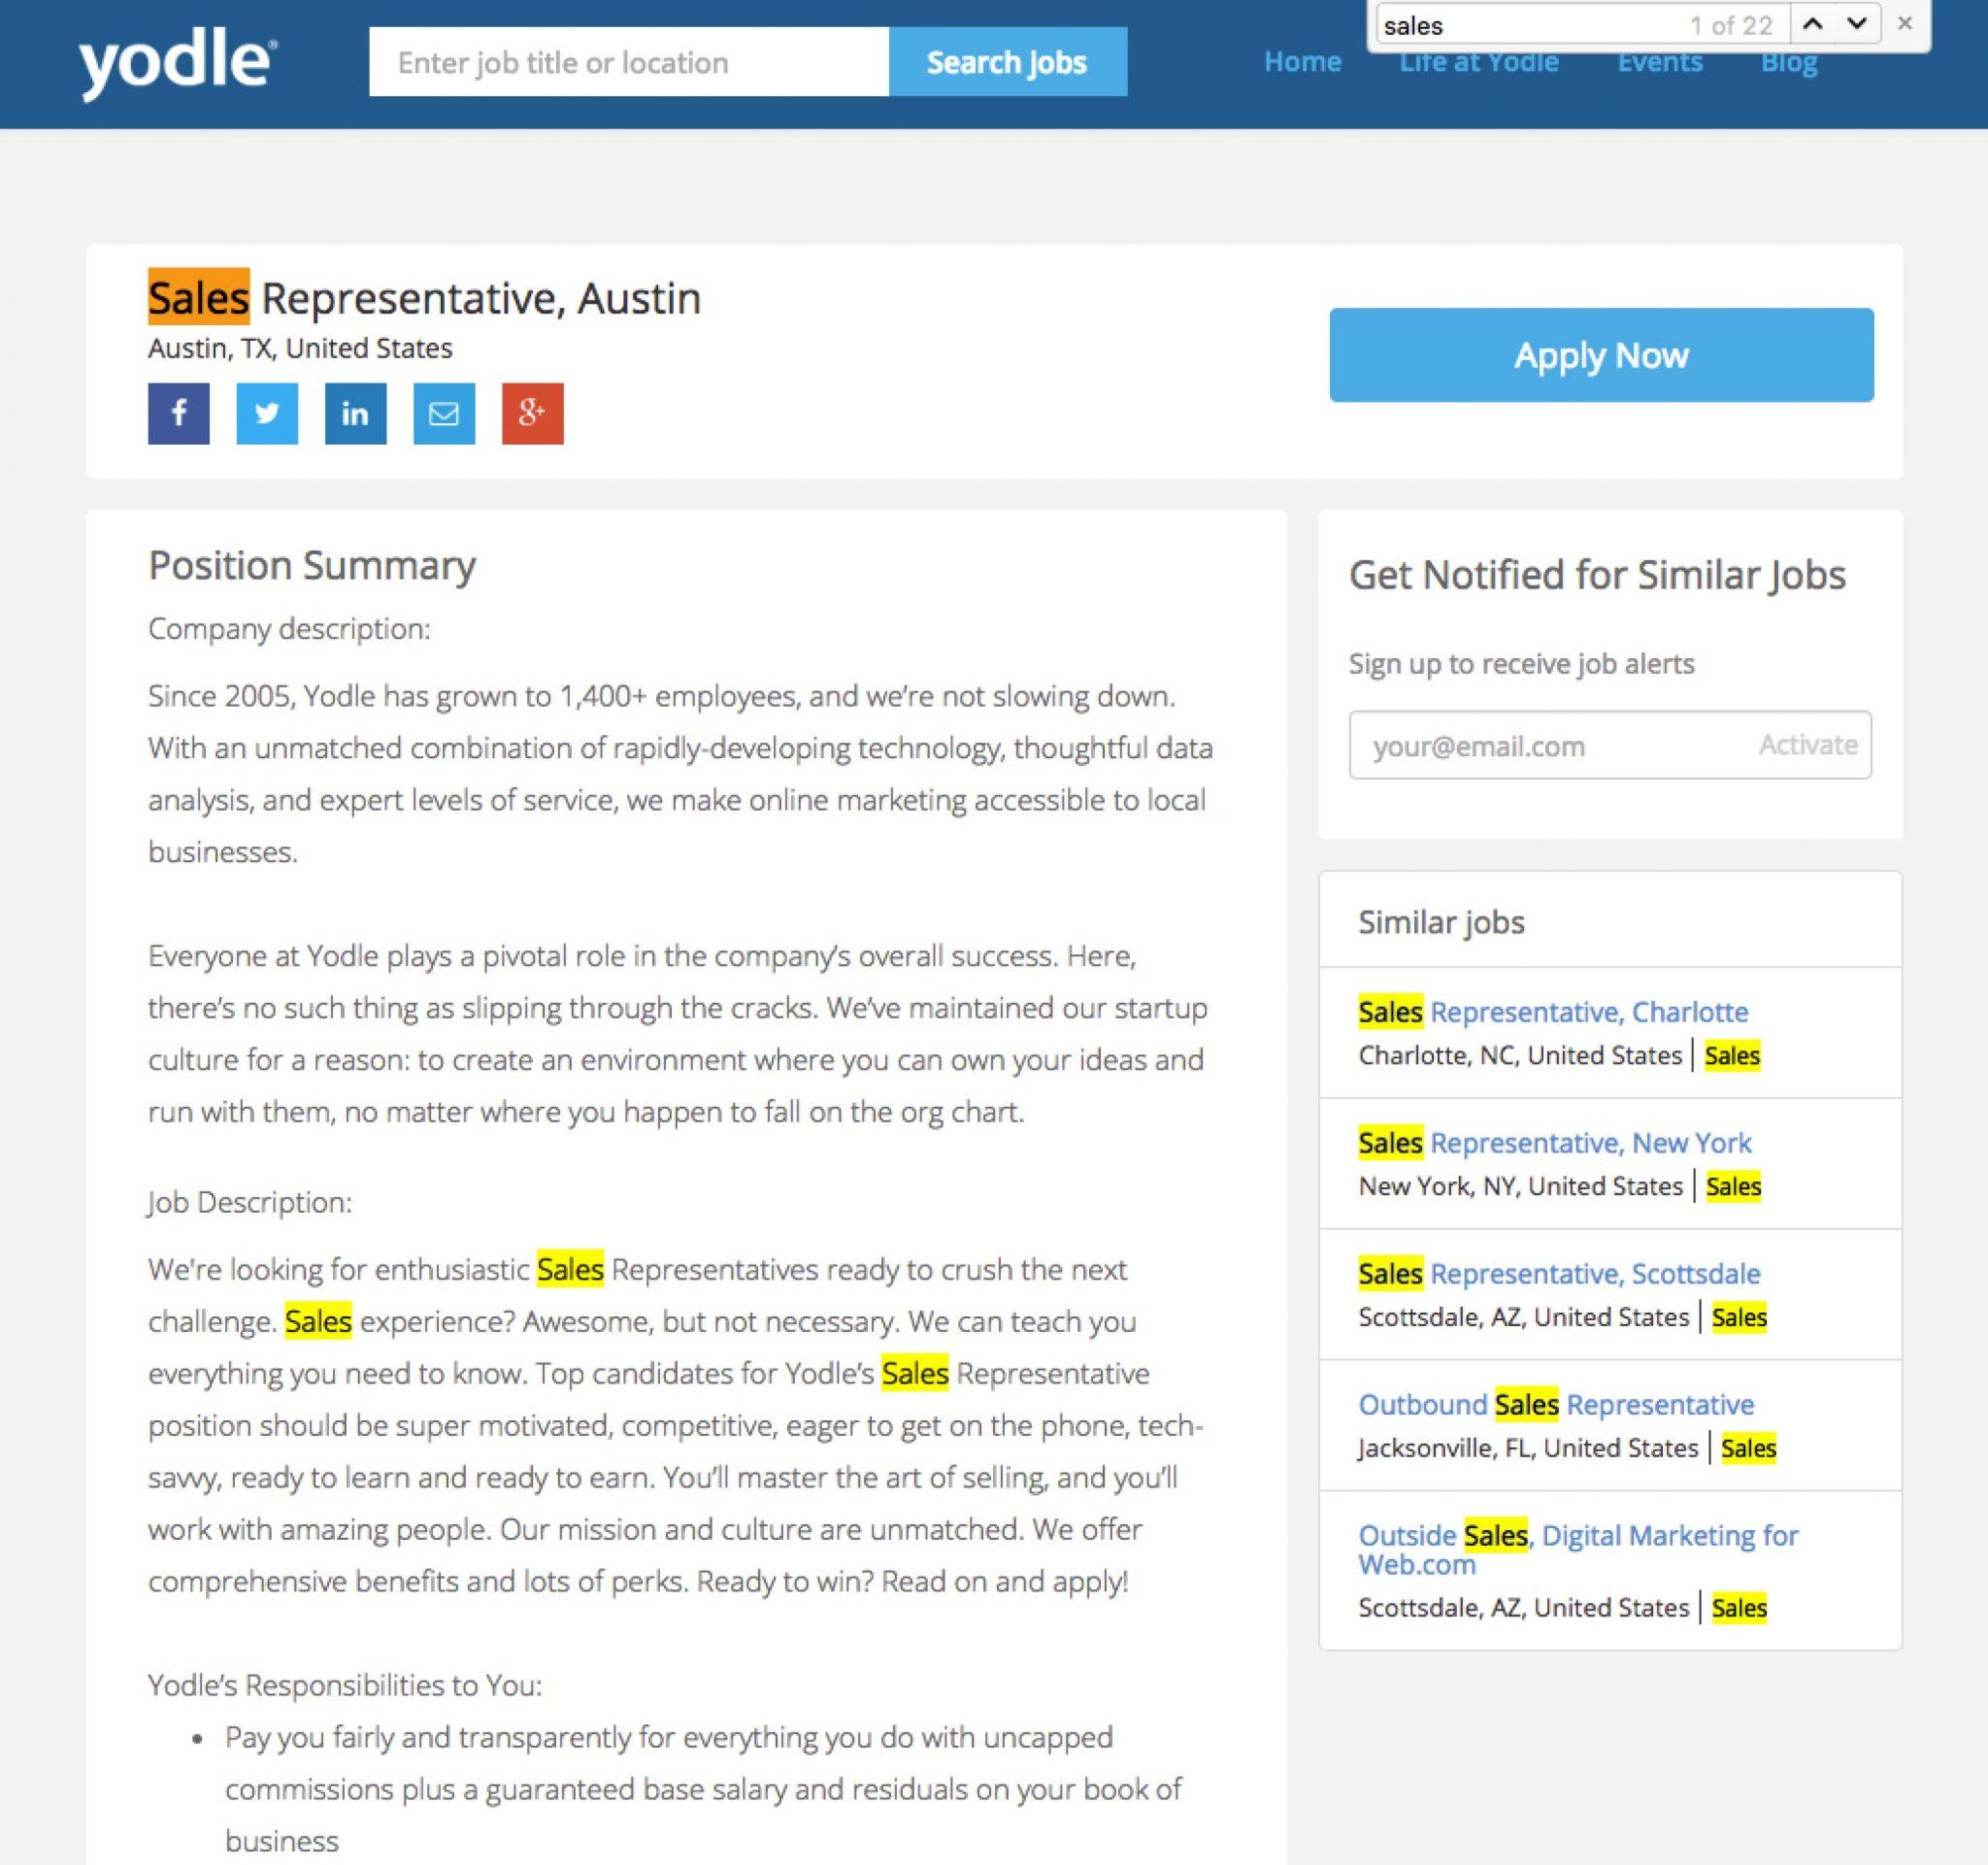 Recruitment-SEO-yodle-sales-rep-job-description-p-1-ongig-blog